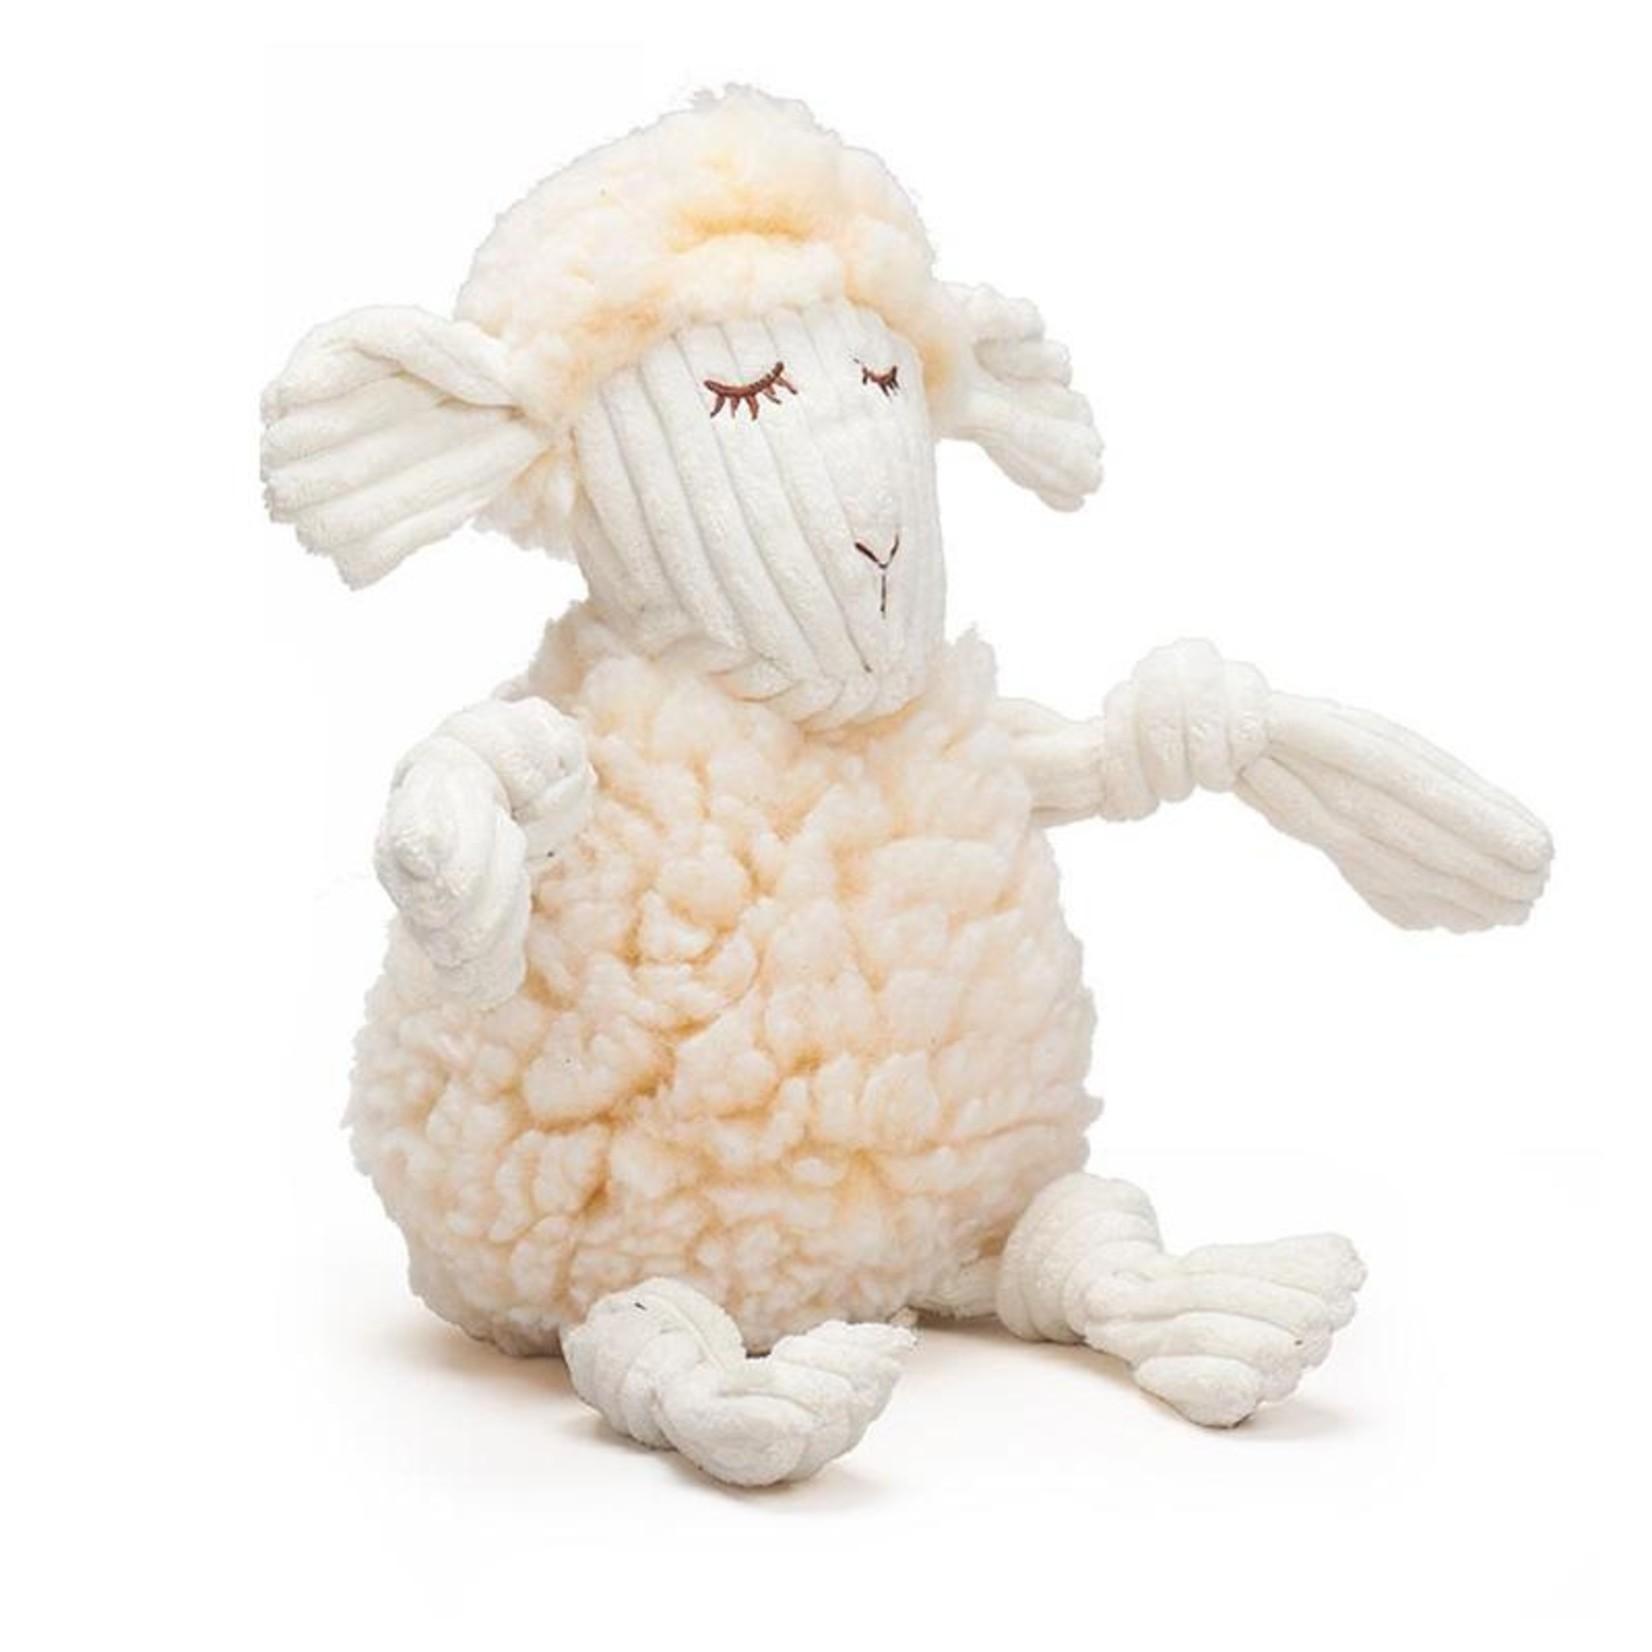 Hugglehounds Hugglehounds Fluffer Knotties Lamb Dog Toy Lrg